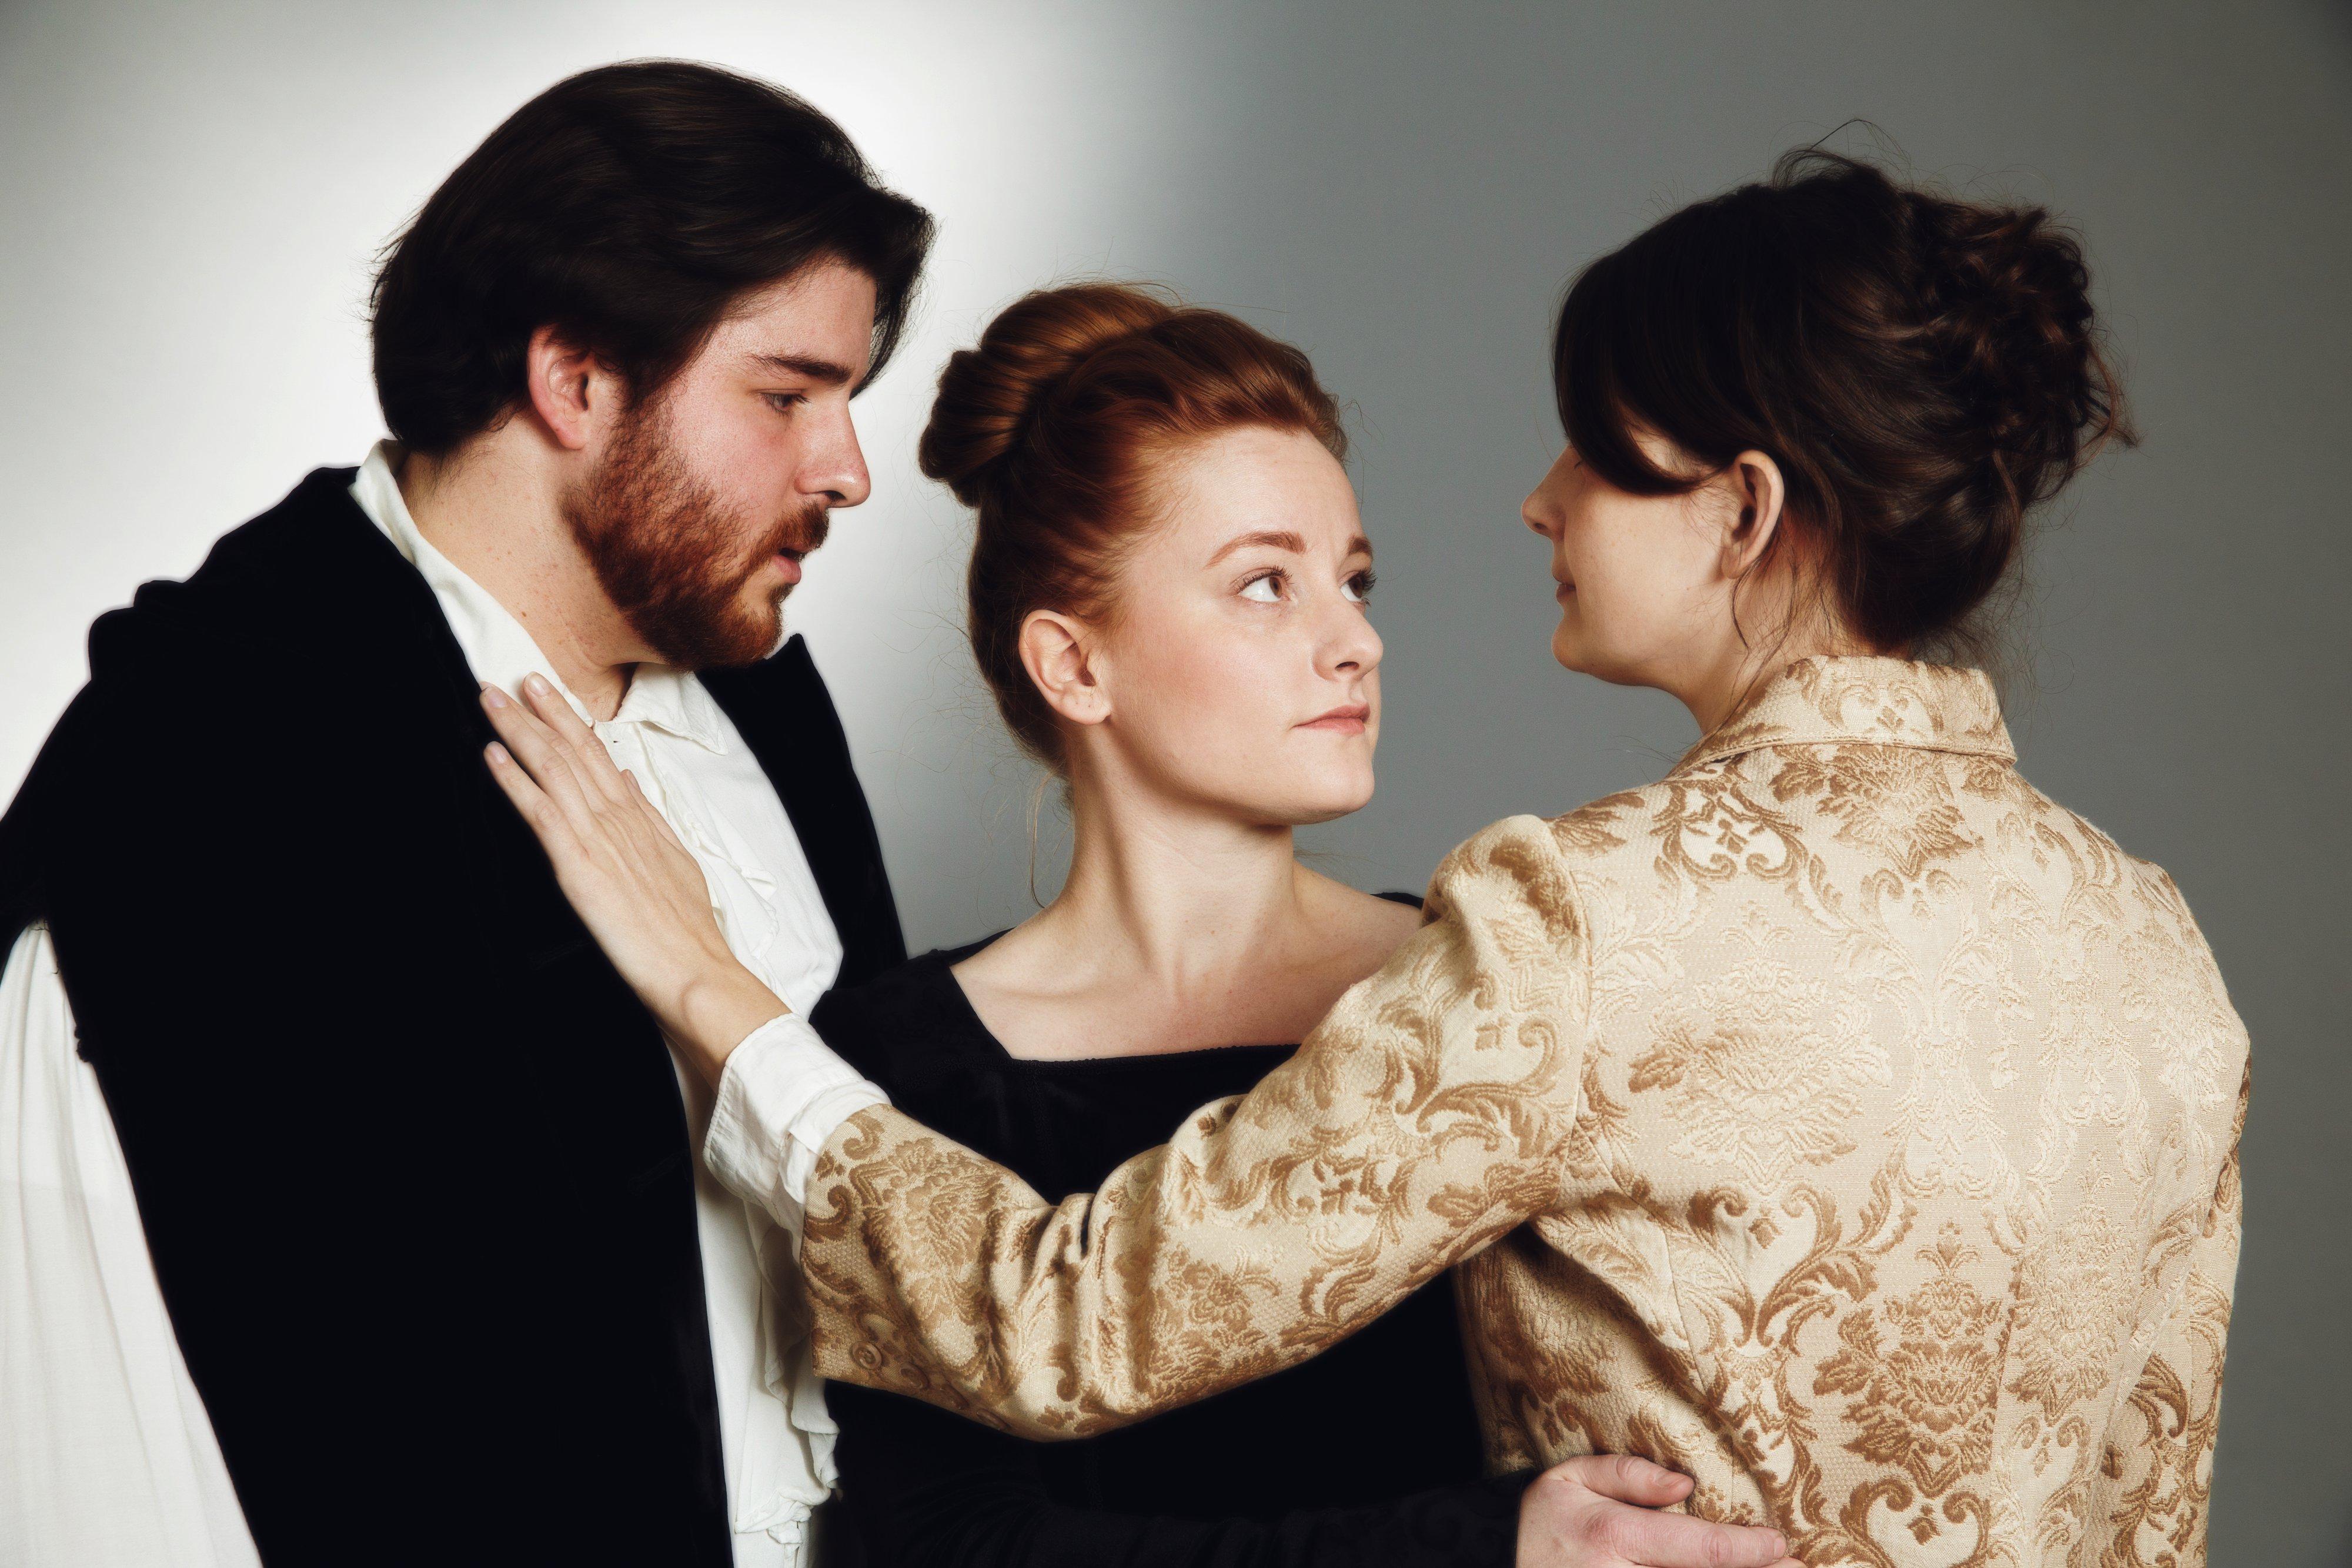 1. Orsino, Olivia, Viola Love Triangle